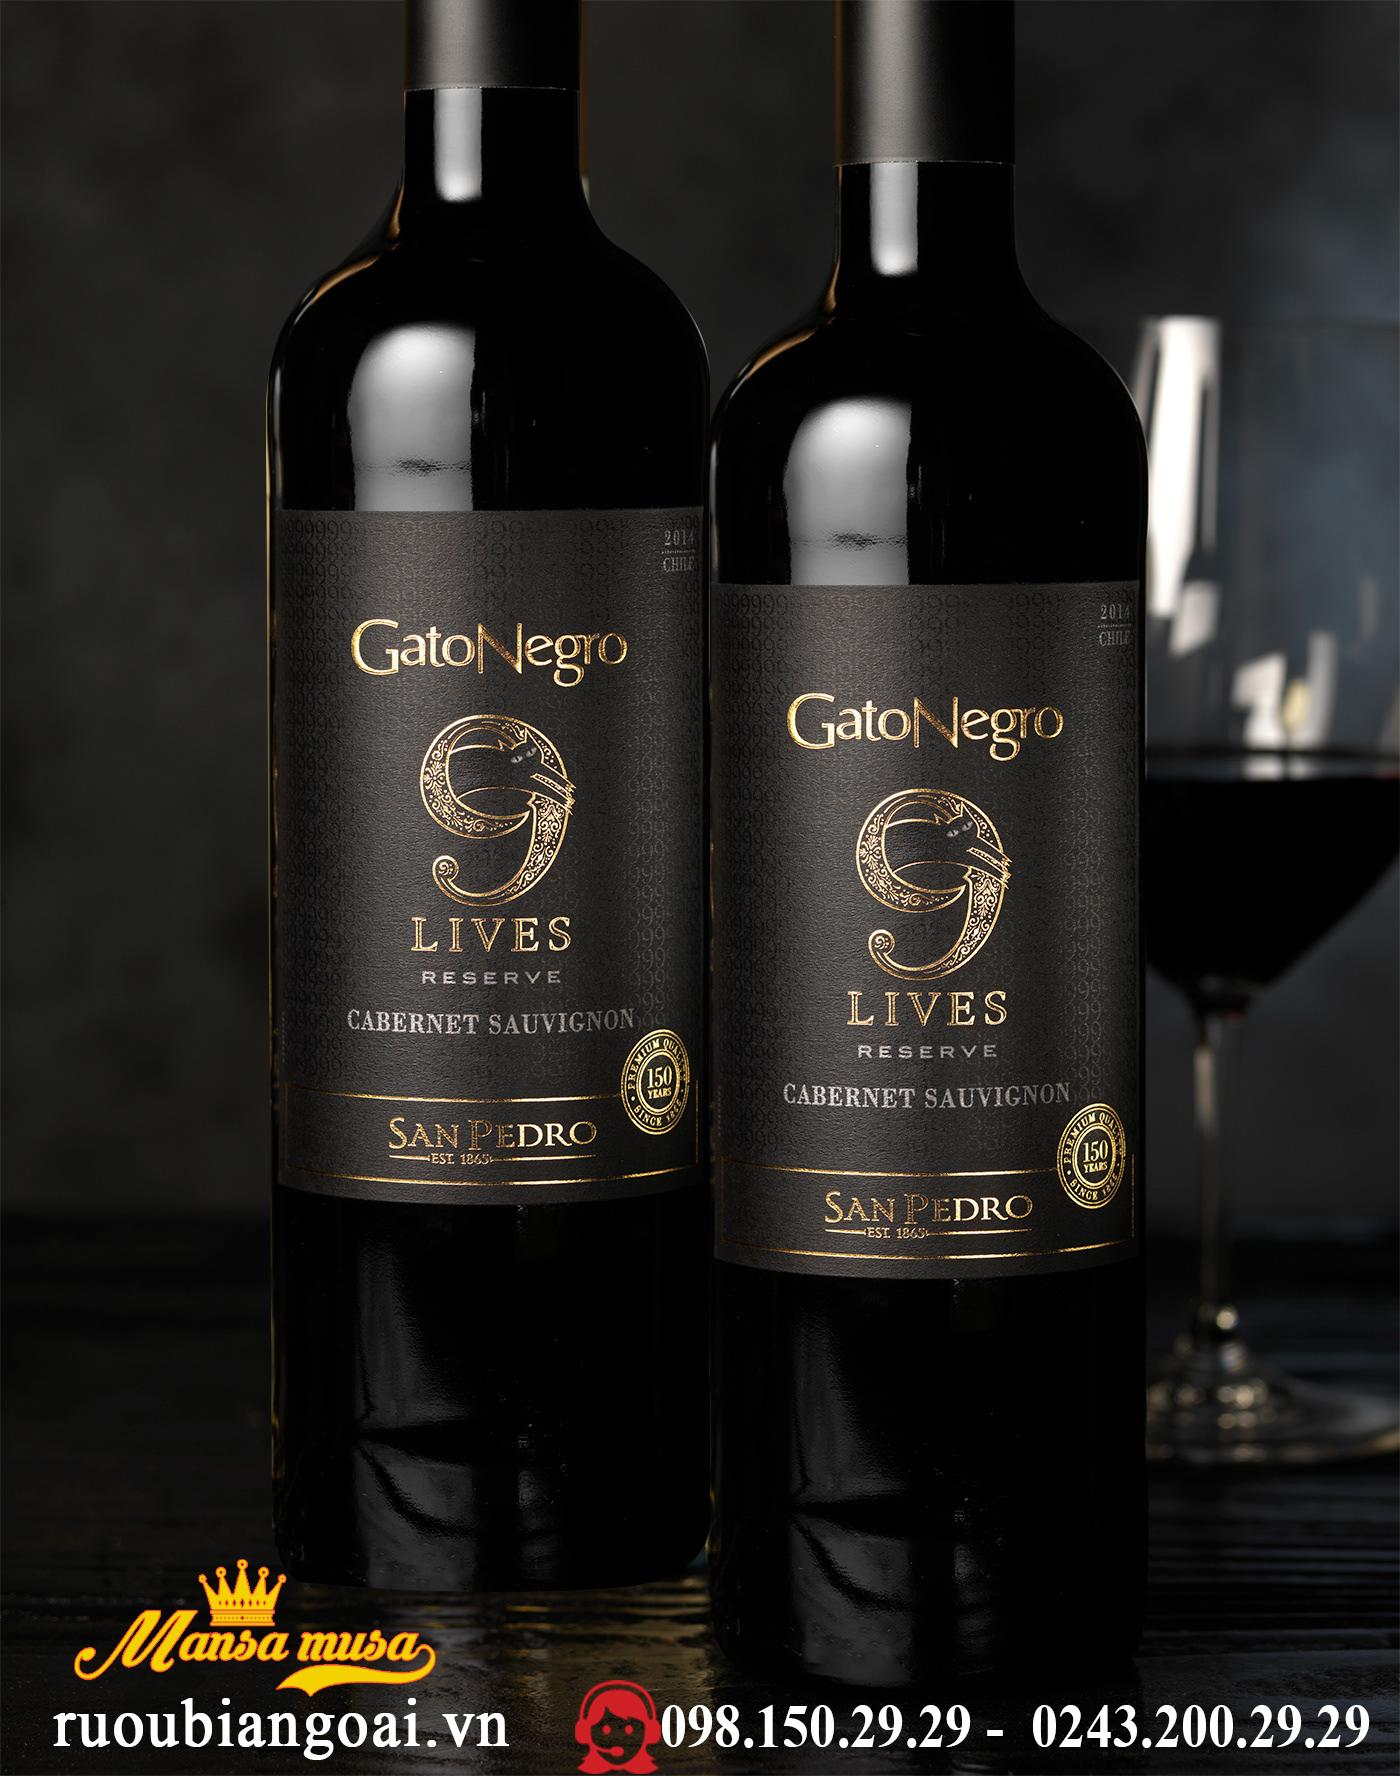 Vang Gato Negro 9 Lives Cabernet Sauvignon